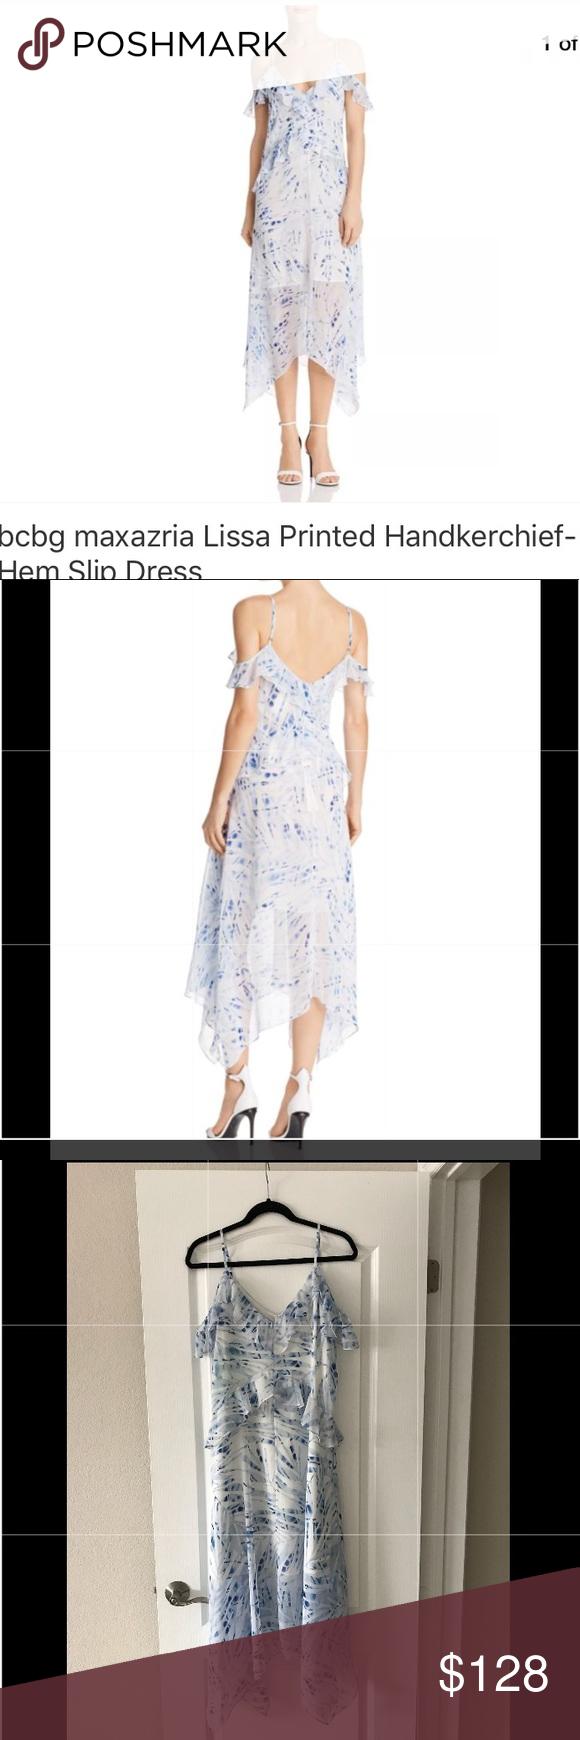 d87a6cb81fa9 Bcbg Maxazria Lissa Printed Handkerchiefs Dress Super cute dress with off  shoulder. Beautiful prints for